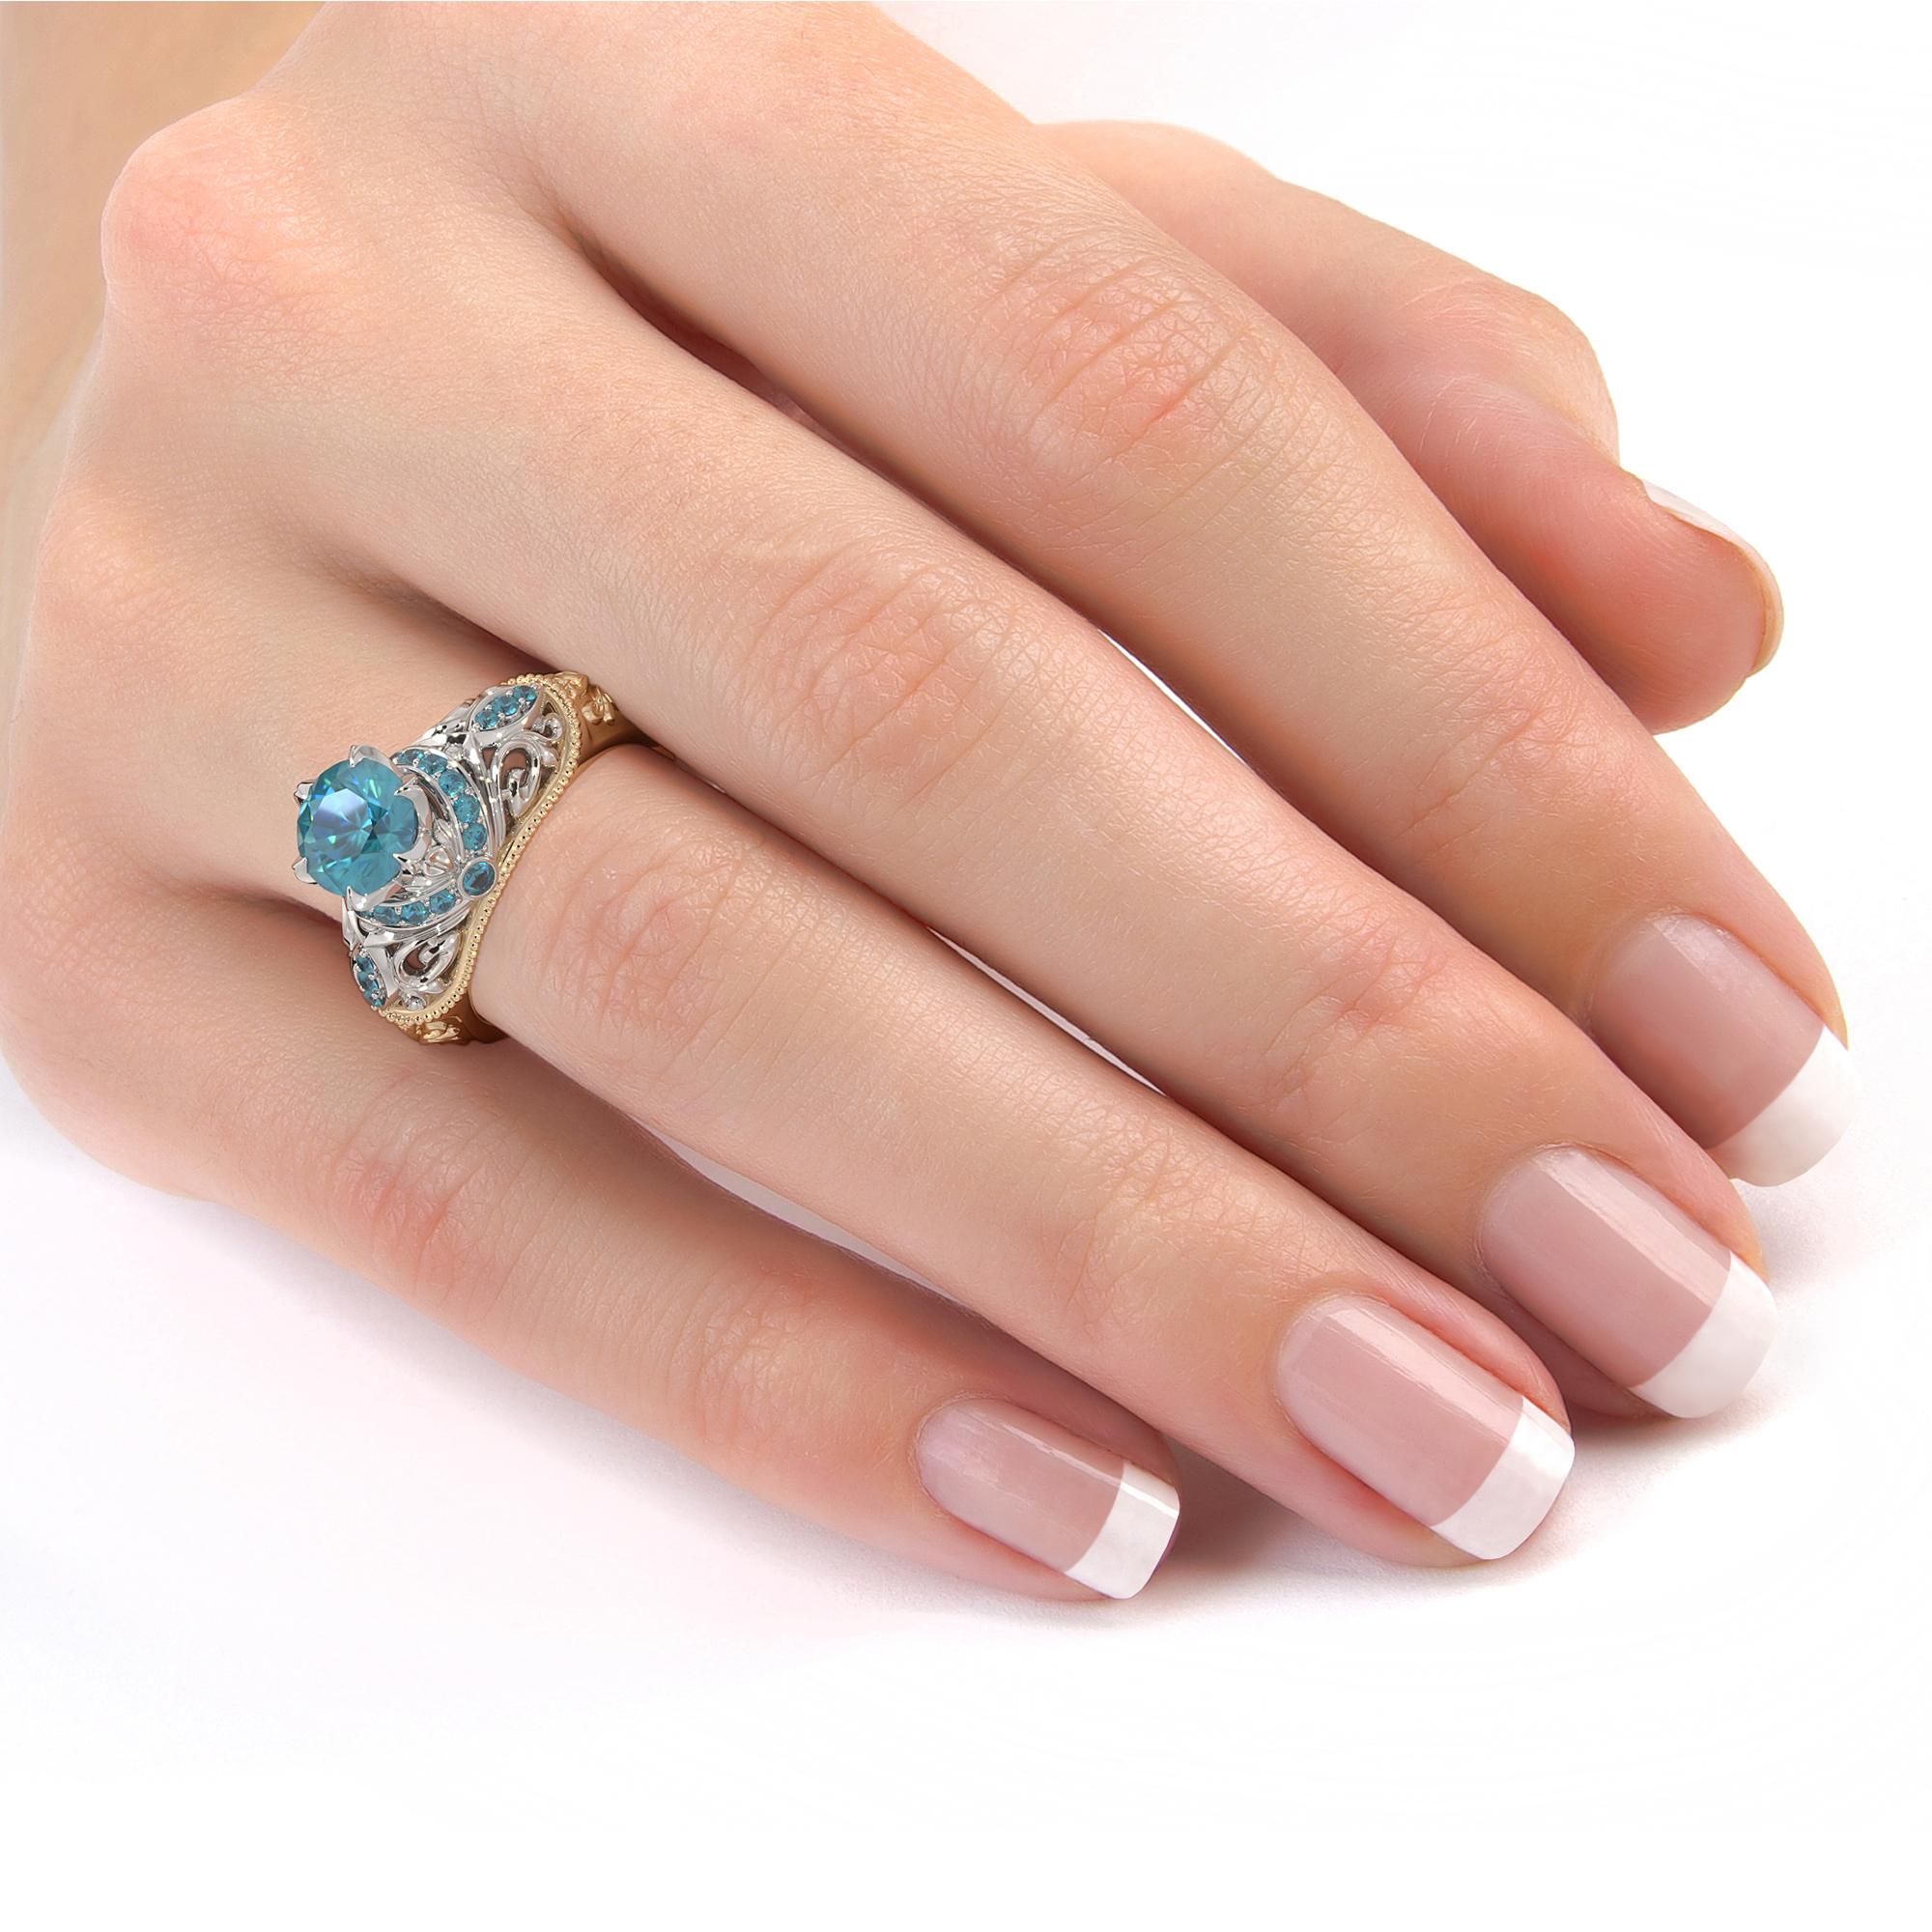 2 Carat Round Blue Diamond Engagement Ring Exalted Grand Vizier Ring Diamonds Halo Ring Handmade 2 Tone Gold Ring Diamond V Ring